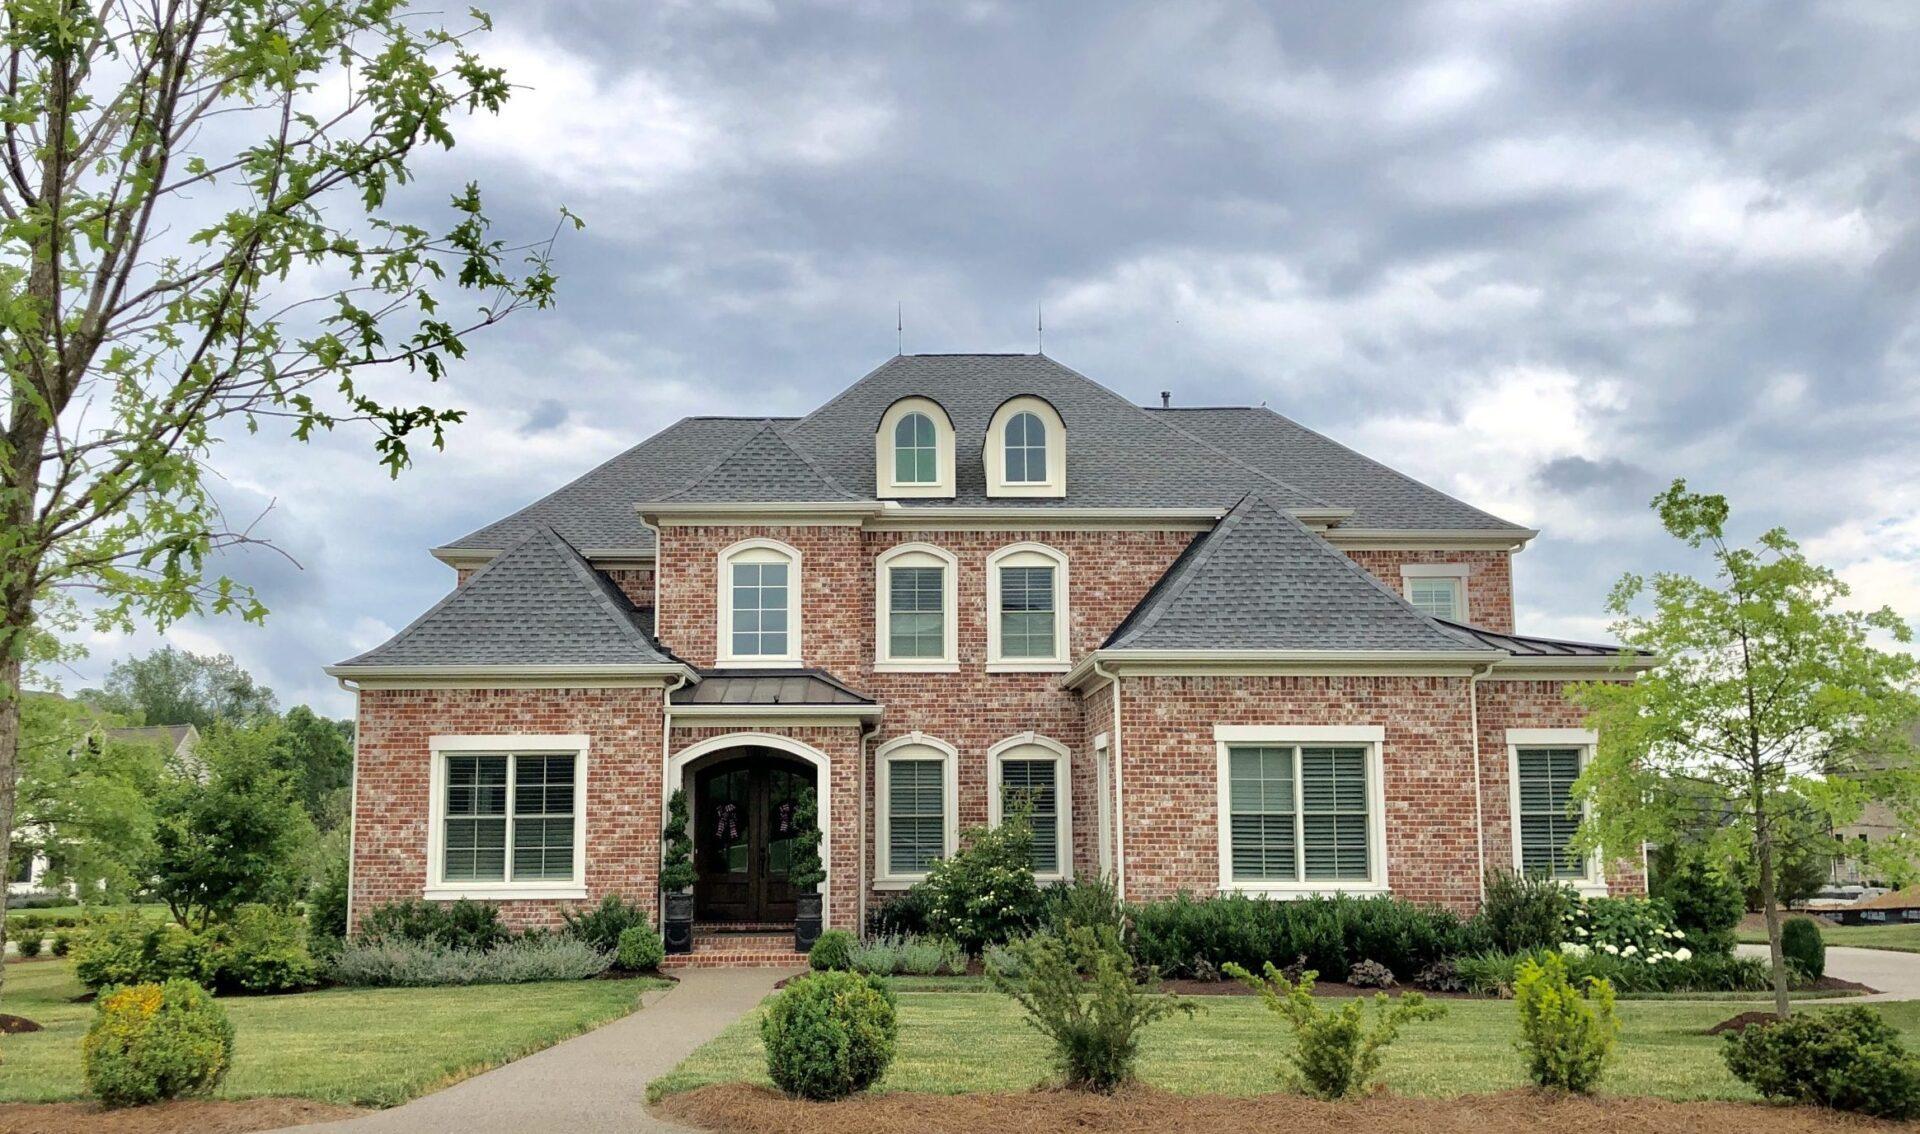 Sunderland M - Premier, High-end home builders for luxury homes - luxury home builder   Nashville, TN